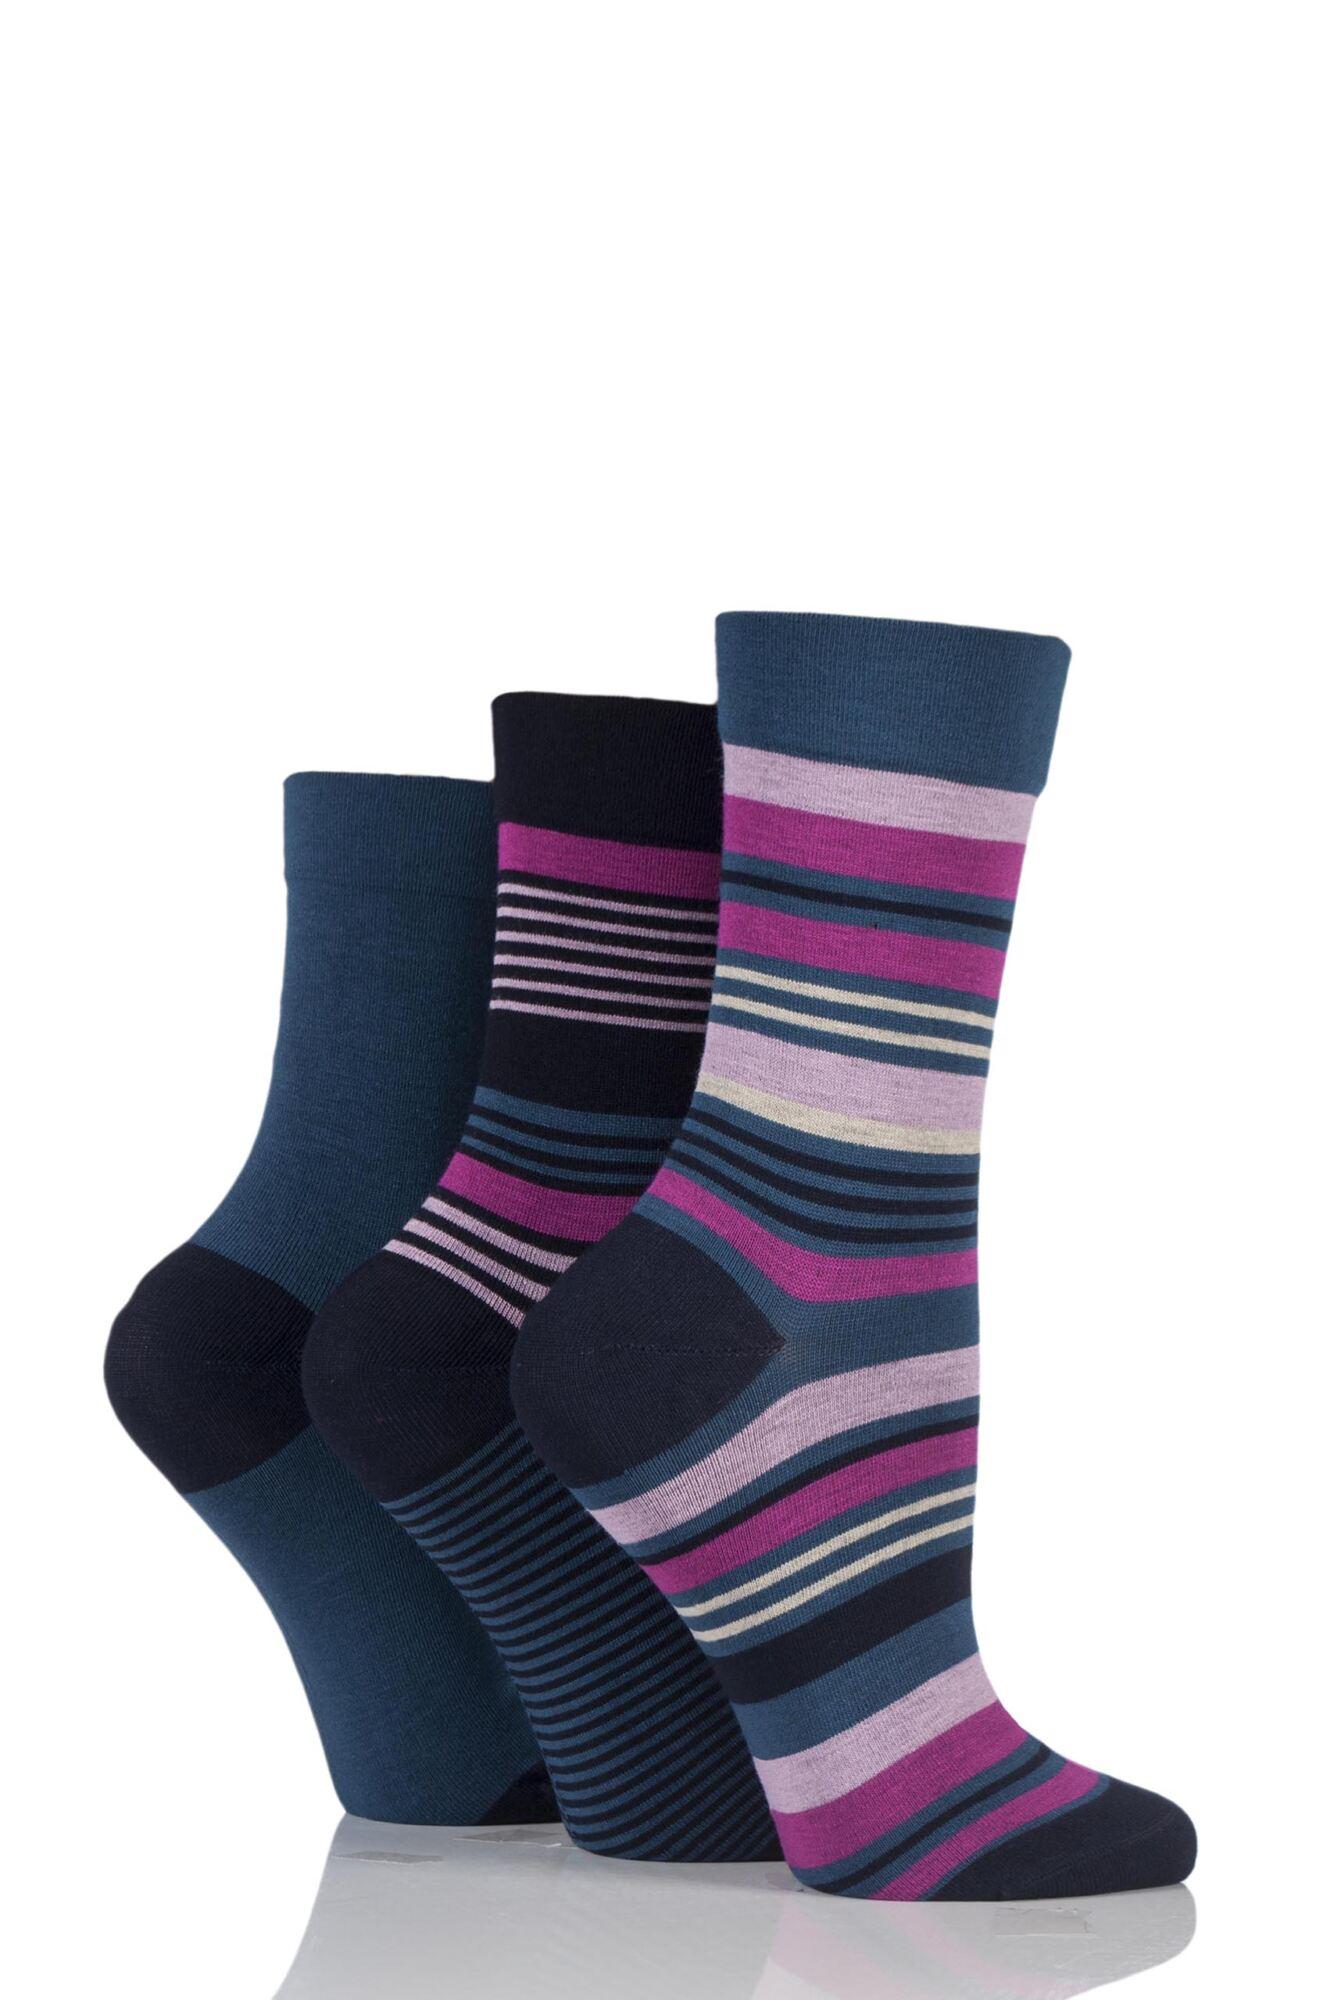 3 Pair Gentle Bamboo Socks with Smooth Toe Seams in Plains and Stripes Ladies - SOCKSHOP